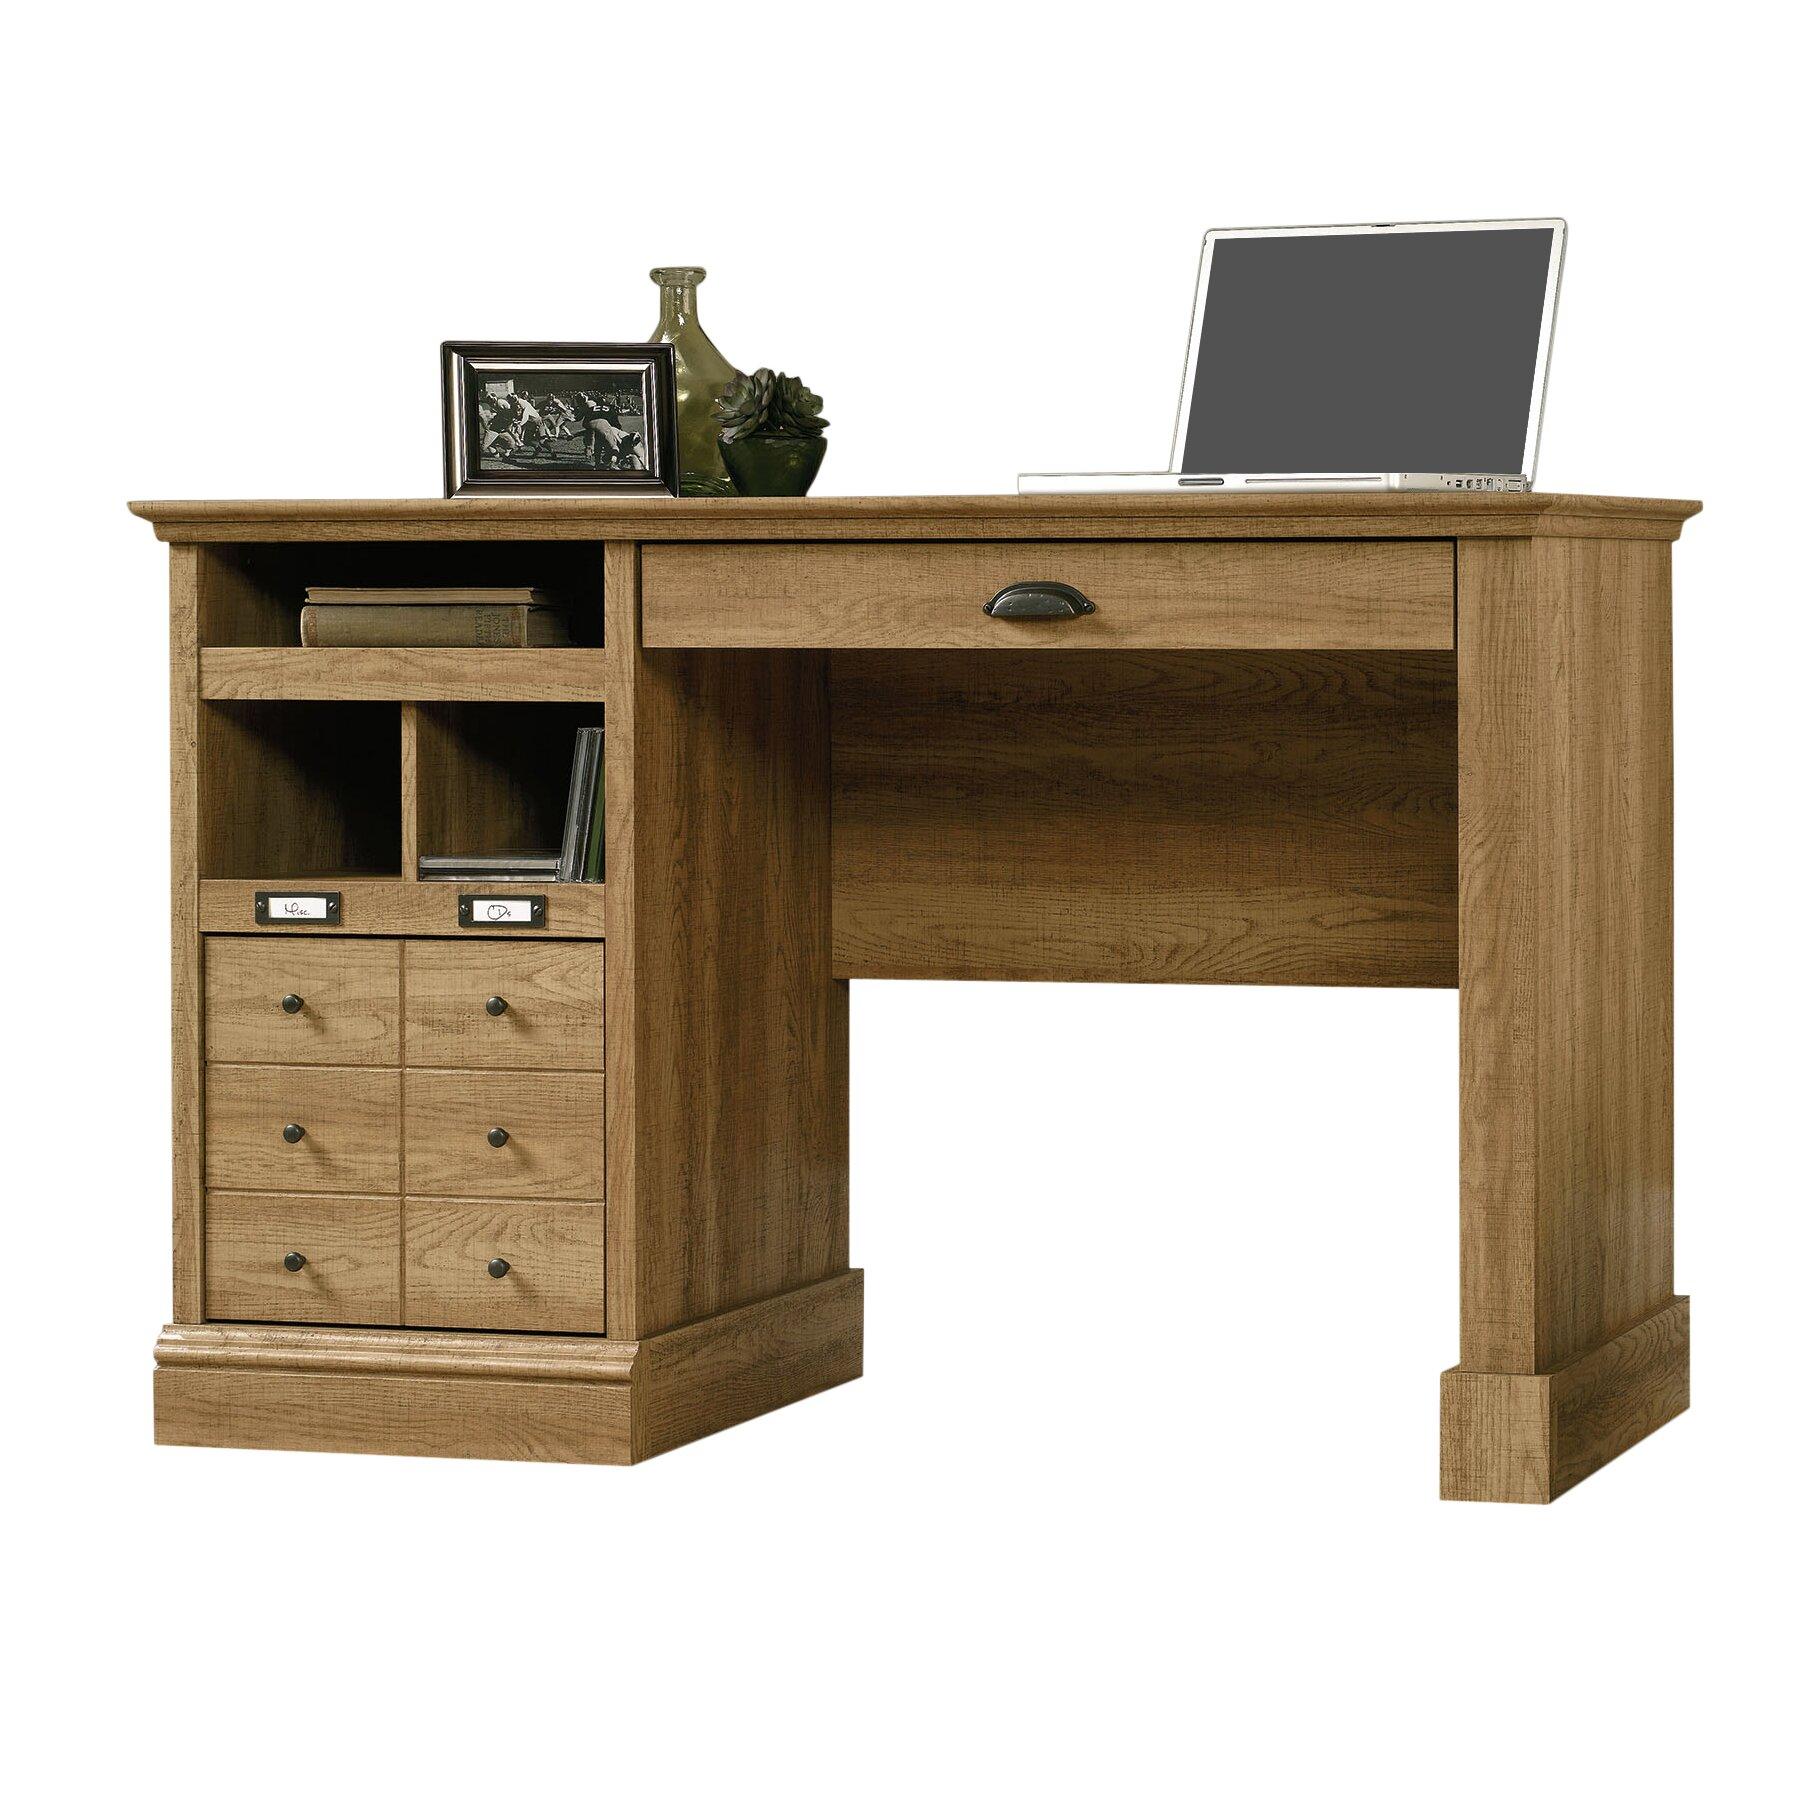 beachcrest home bowerbank computer desk with 2 storage drawers reviews wayfair. Black Bedroom Furniture Sets. Home Design Ideas